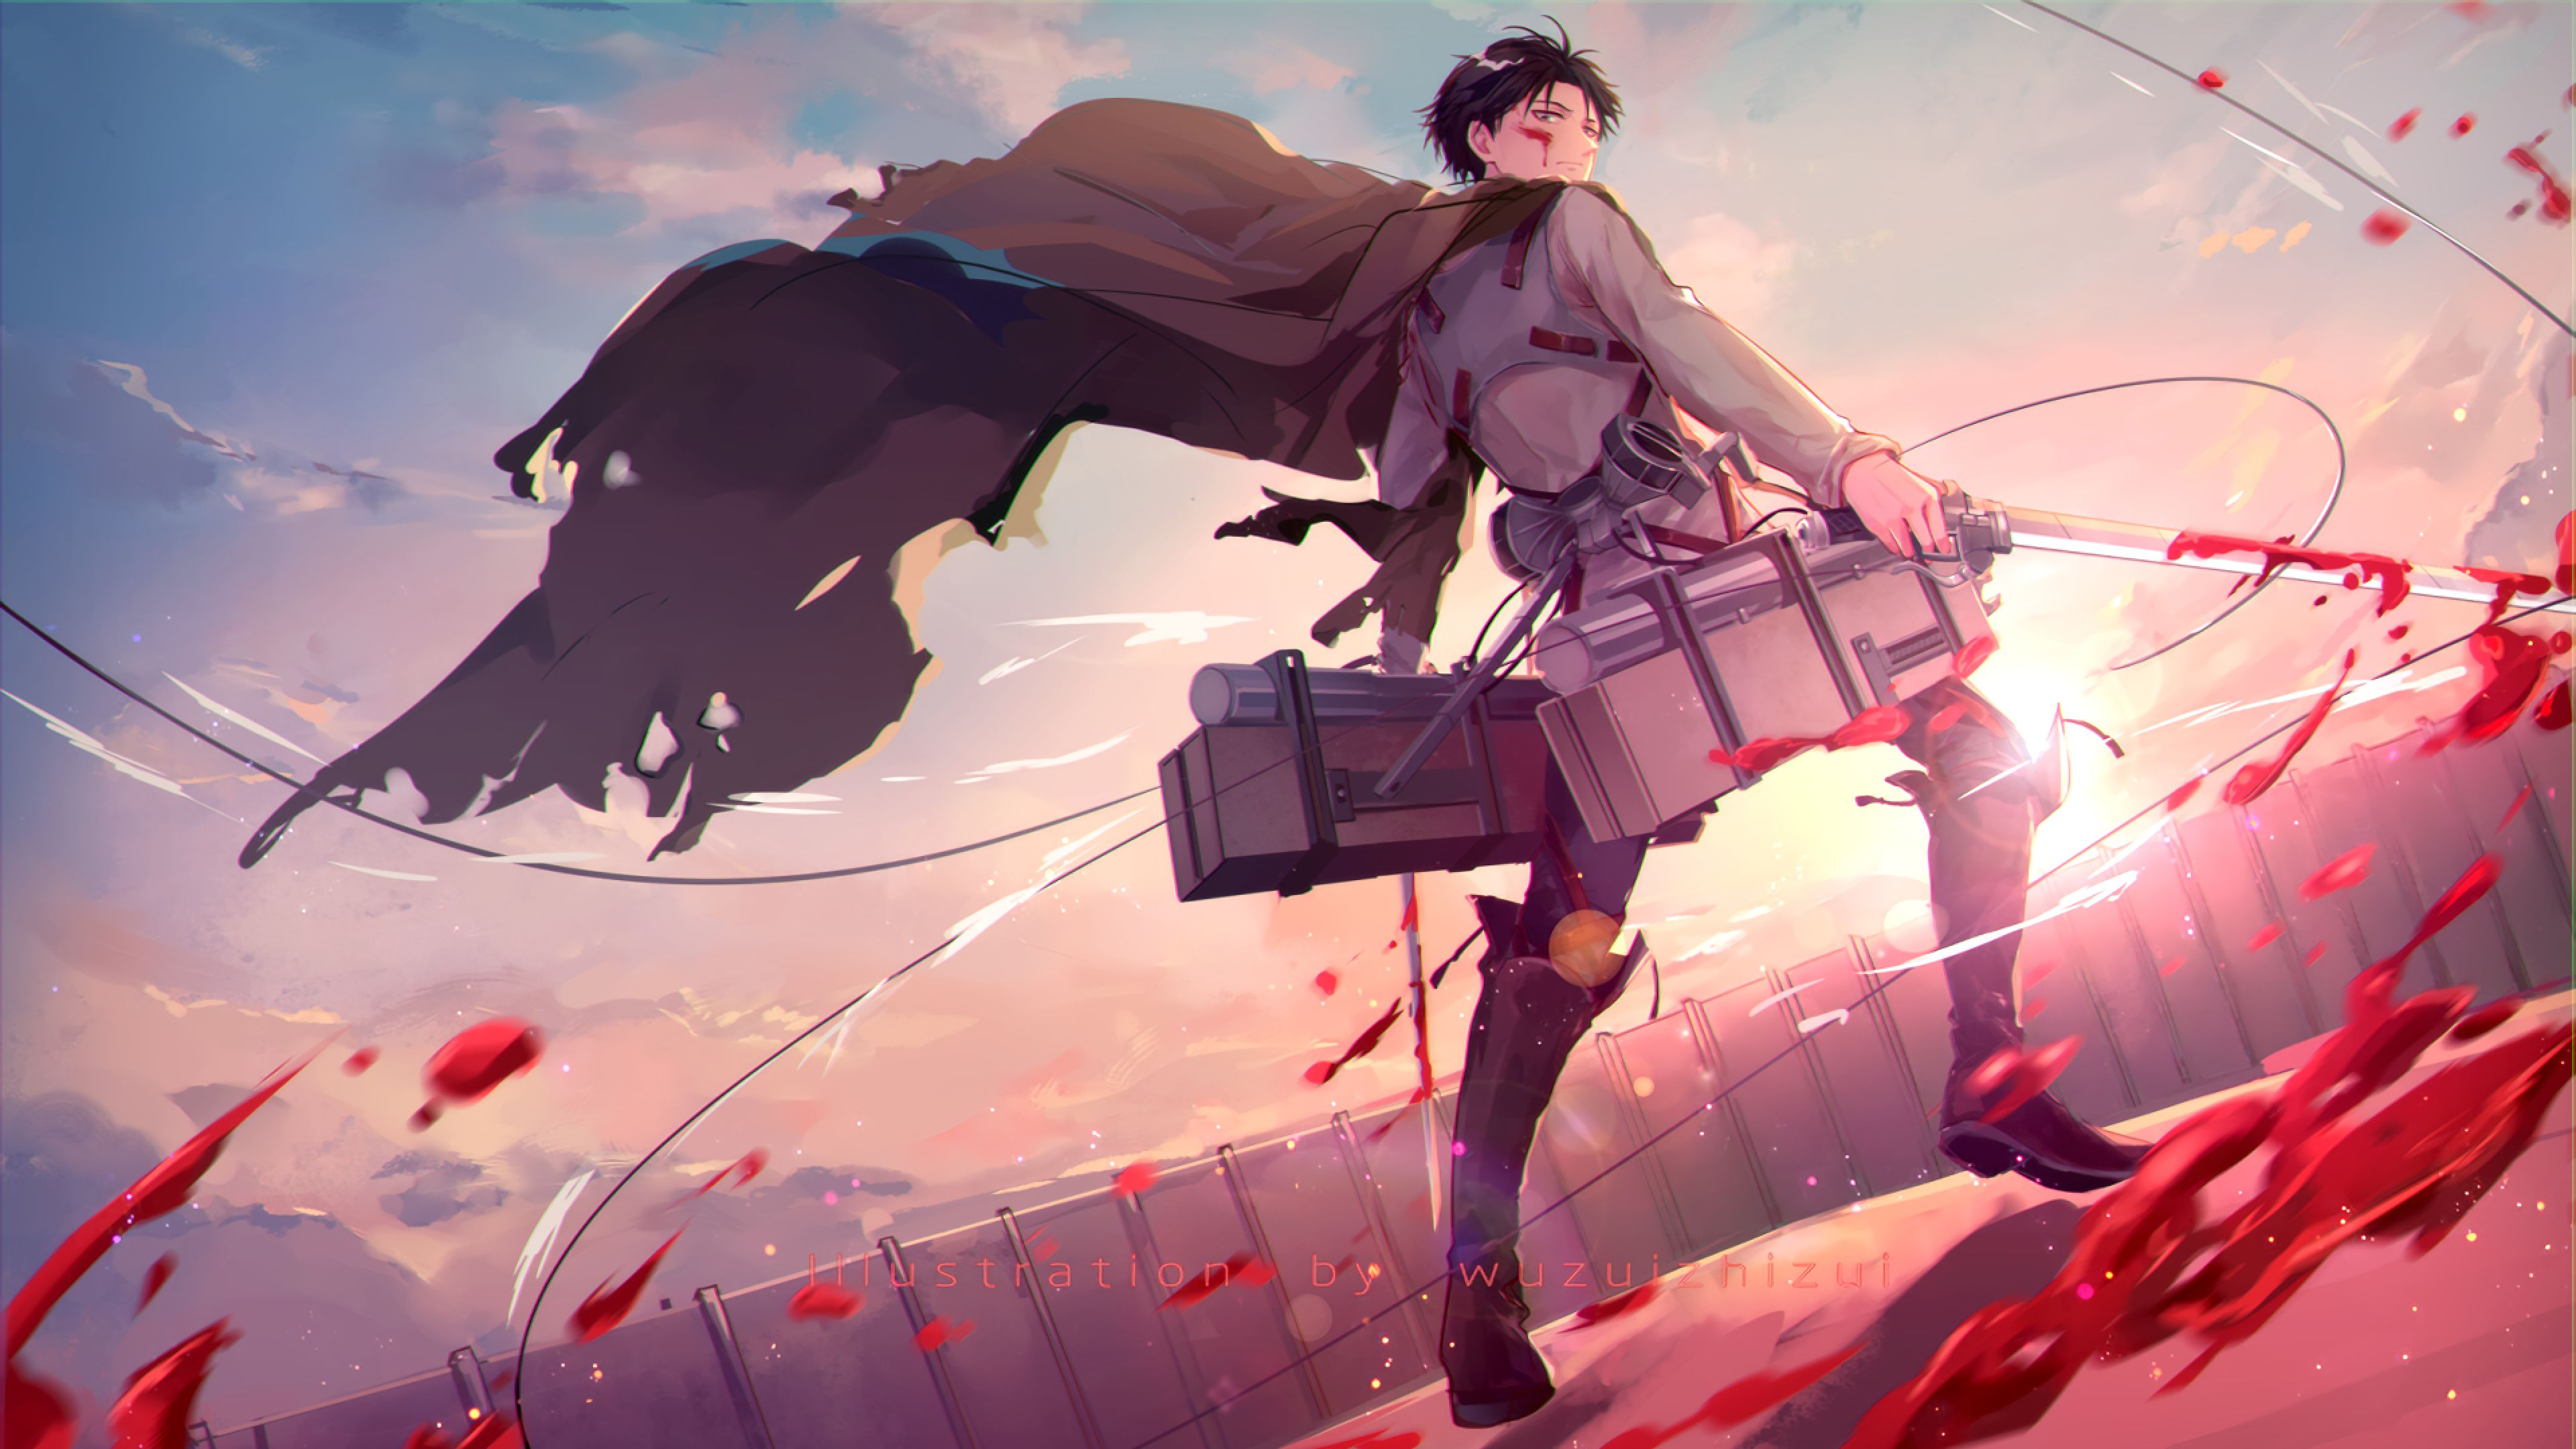 Attack On Titan Levi Anime 4k Levi Ackerman Wallpaper Anime Wallpaper 1920x1080 29 anime pc wallpaper